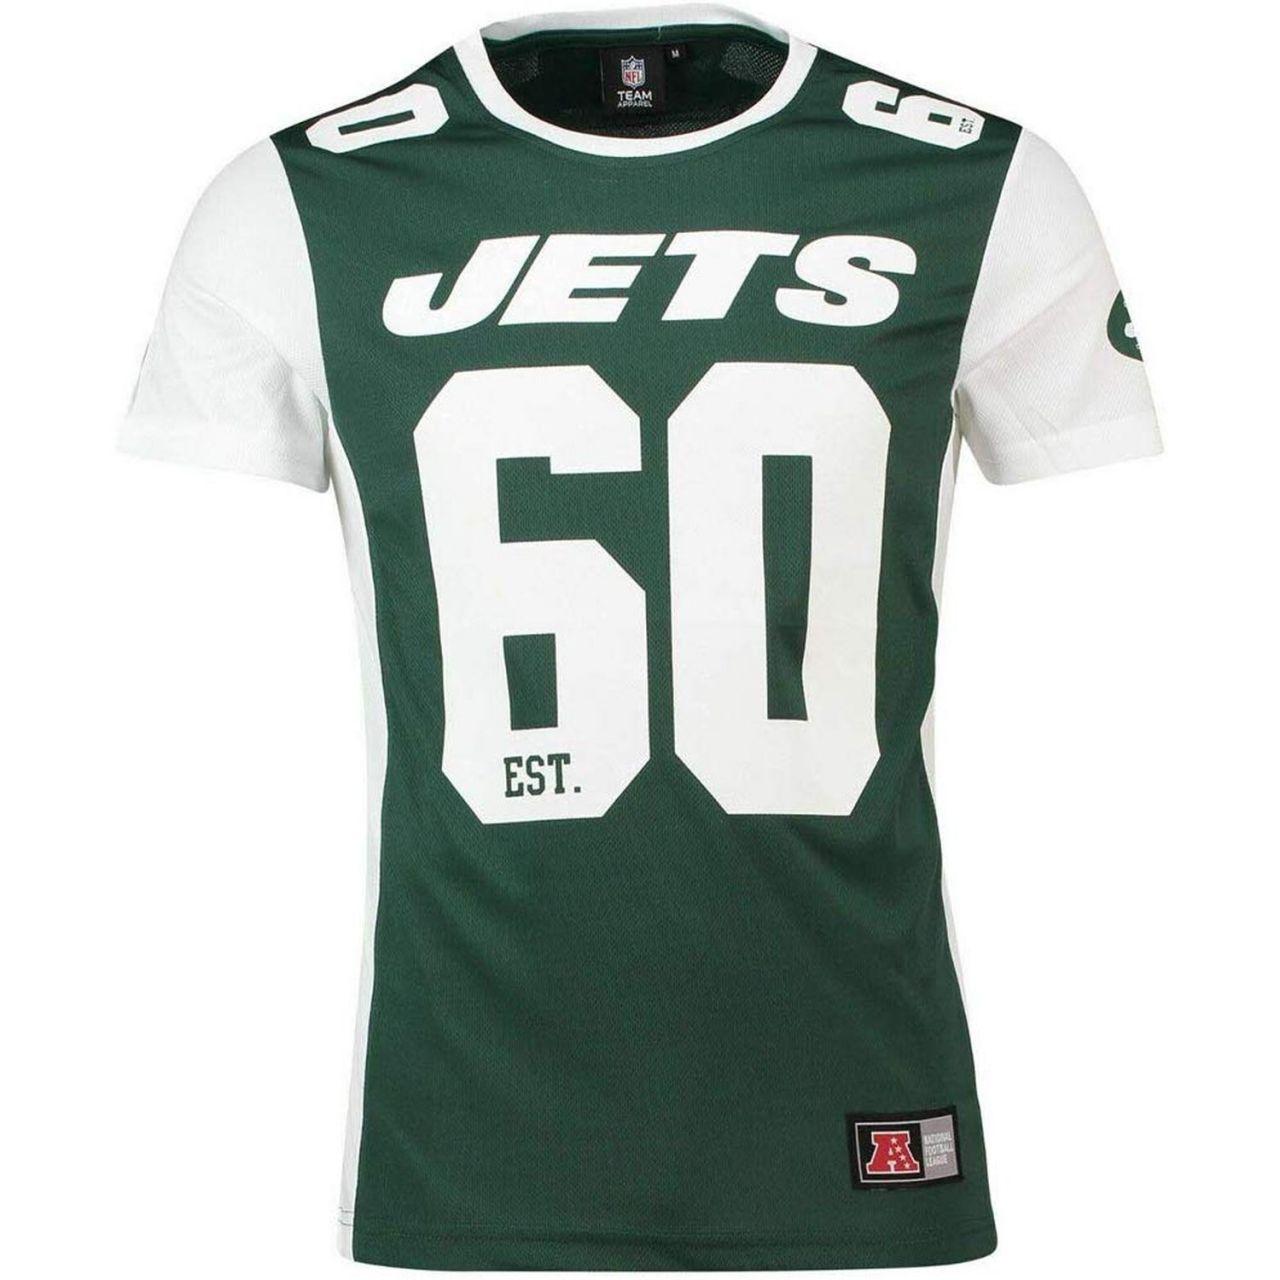 amfoo - Majestic NFL Mesh Polyester Jersey Shirt - New York Jets